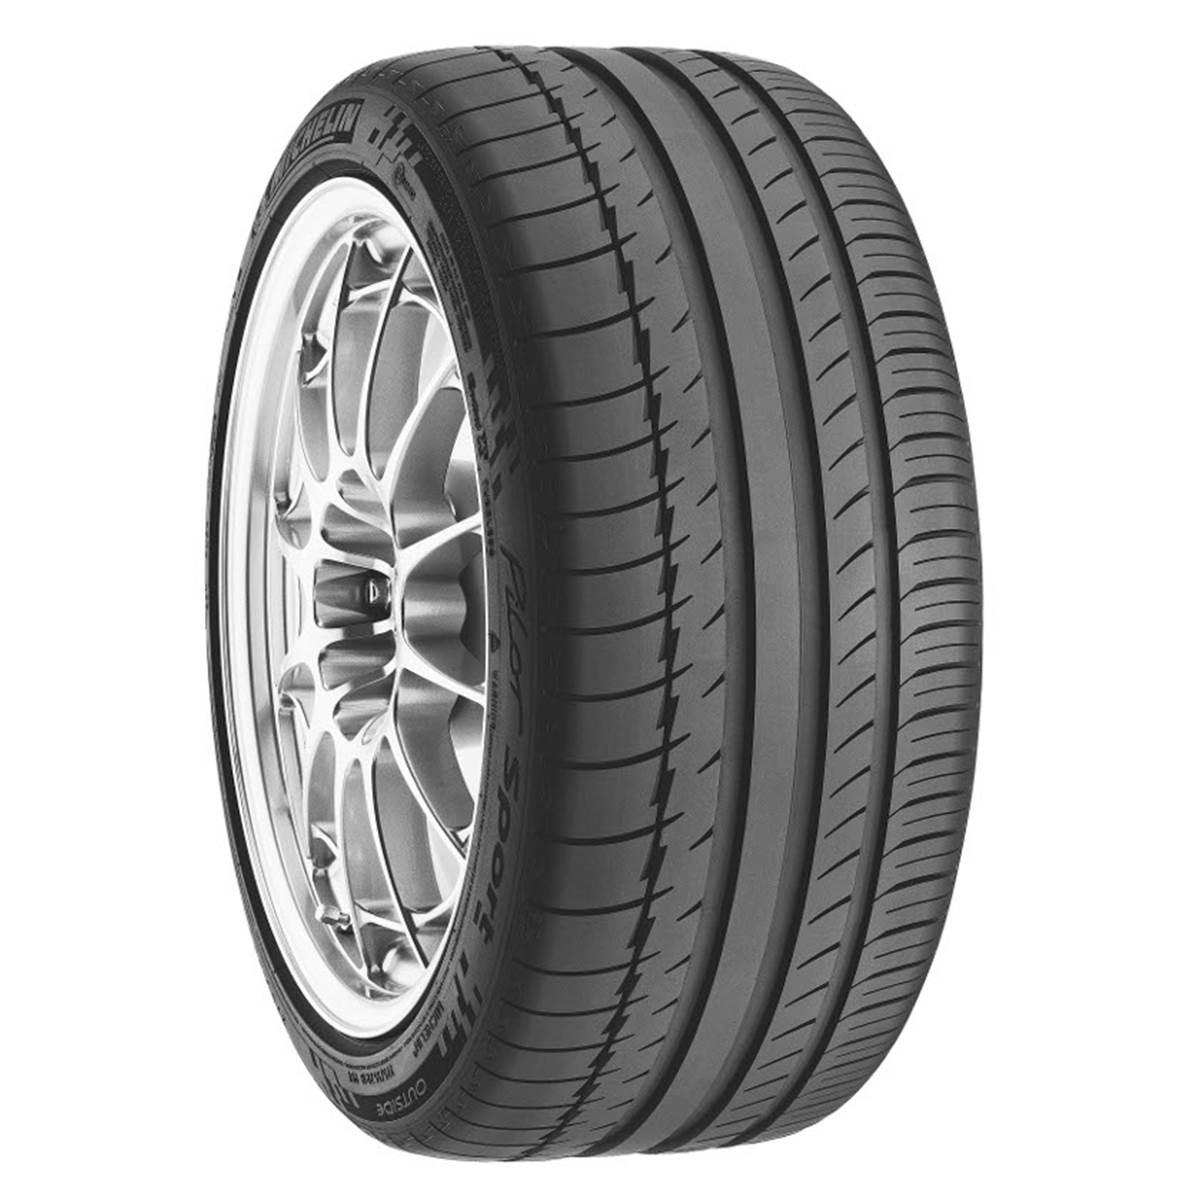 Pneu Michelin 225/40R18 92Y Pilot Sport Ps2 XL